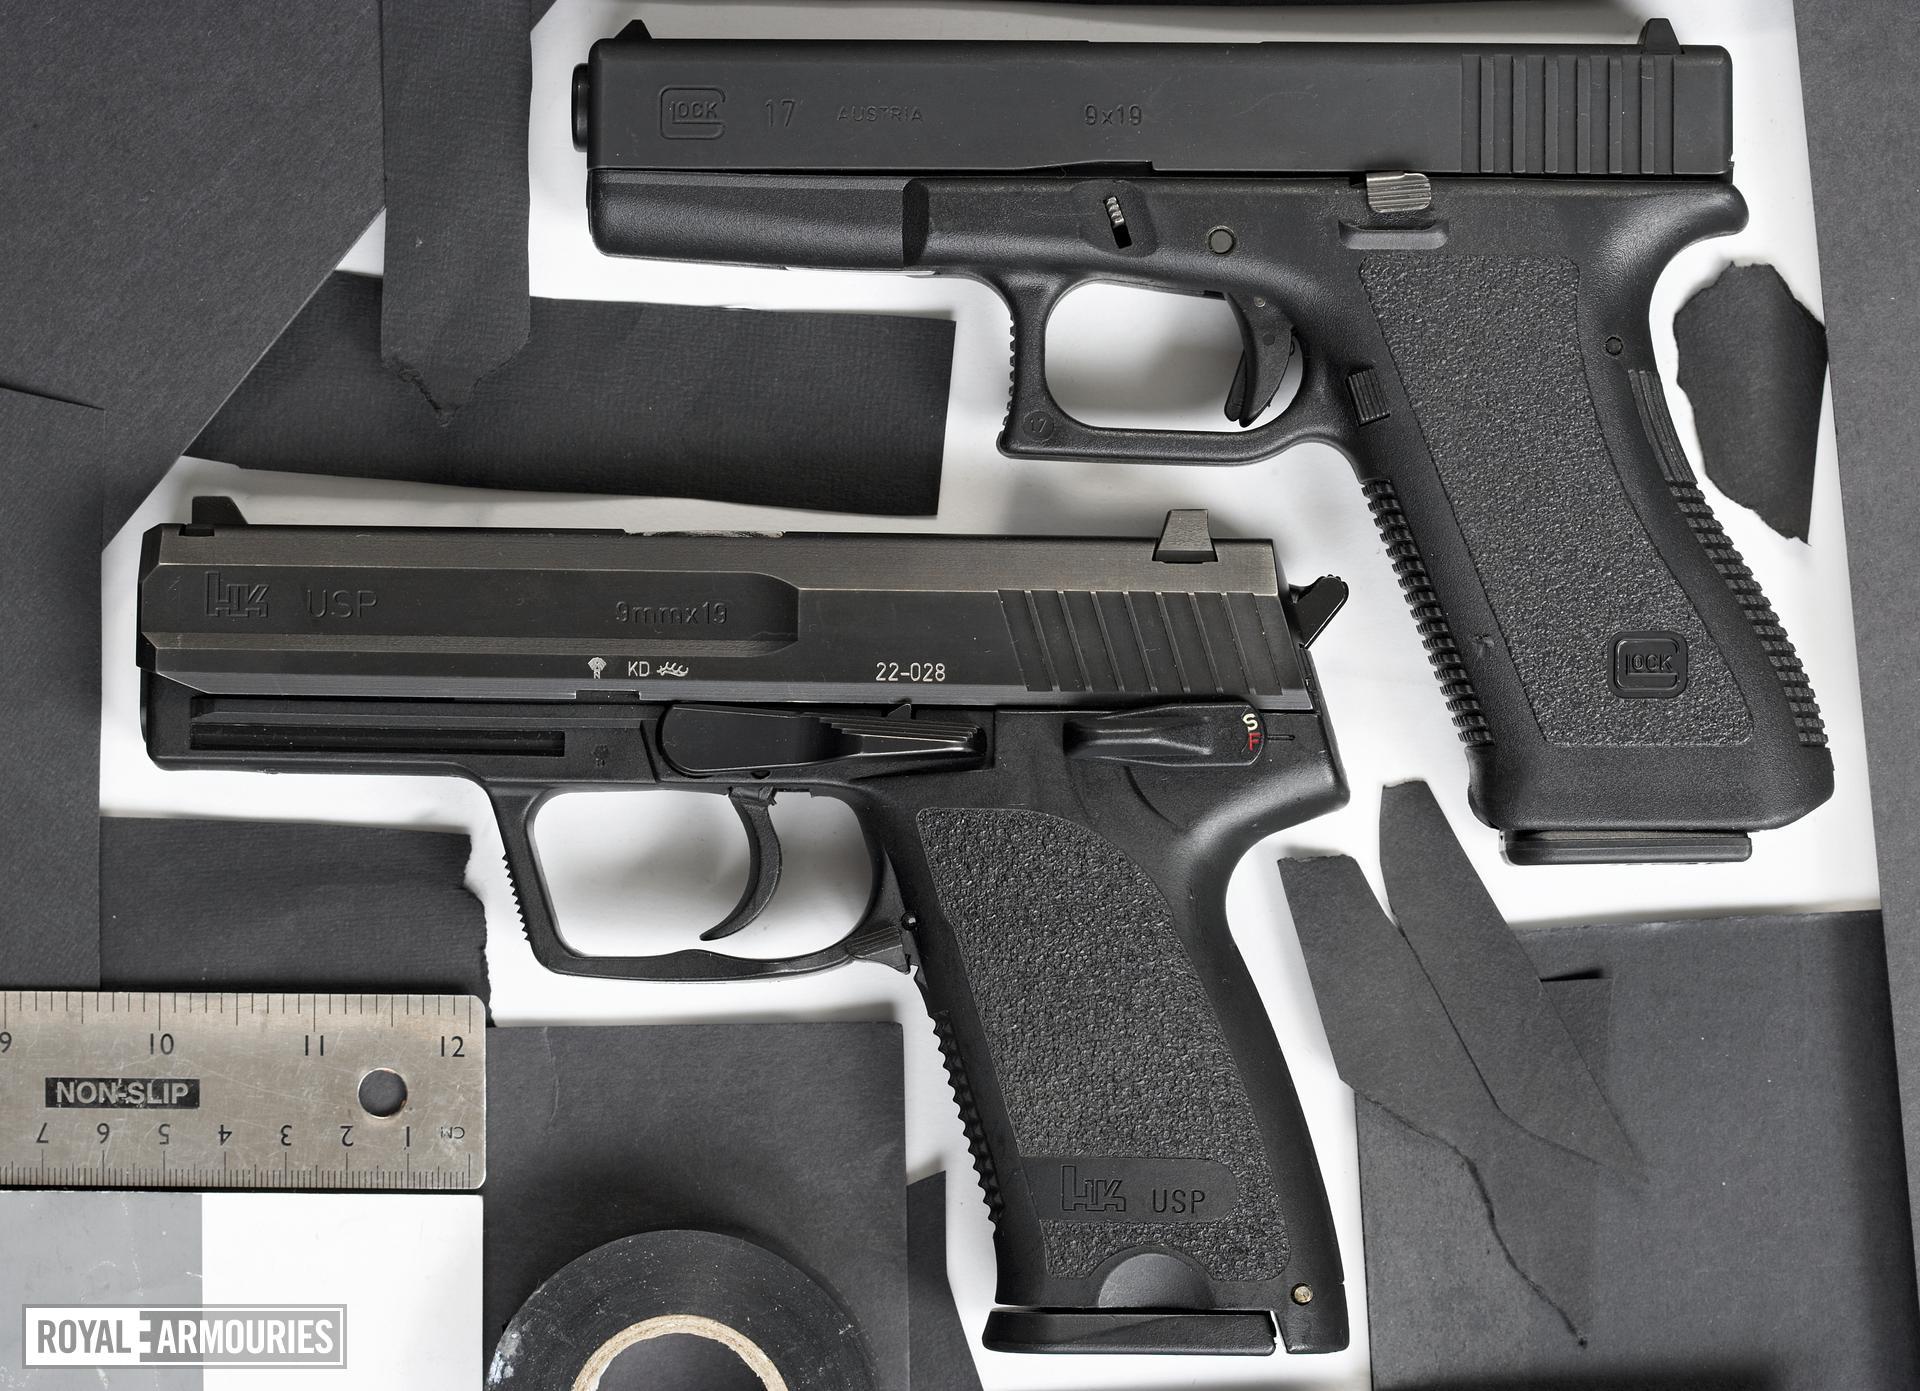 Centrefire self-loading pistol - Glock 17 Generation 2 Standard Generation 2 pattern full-size service pistol.